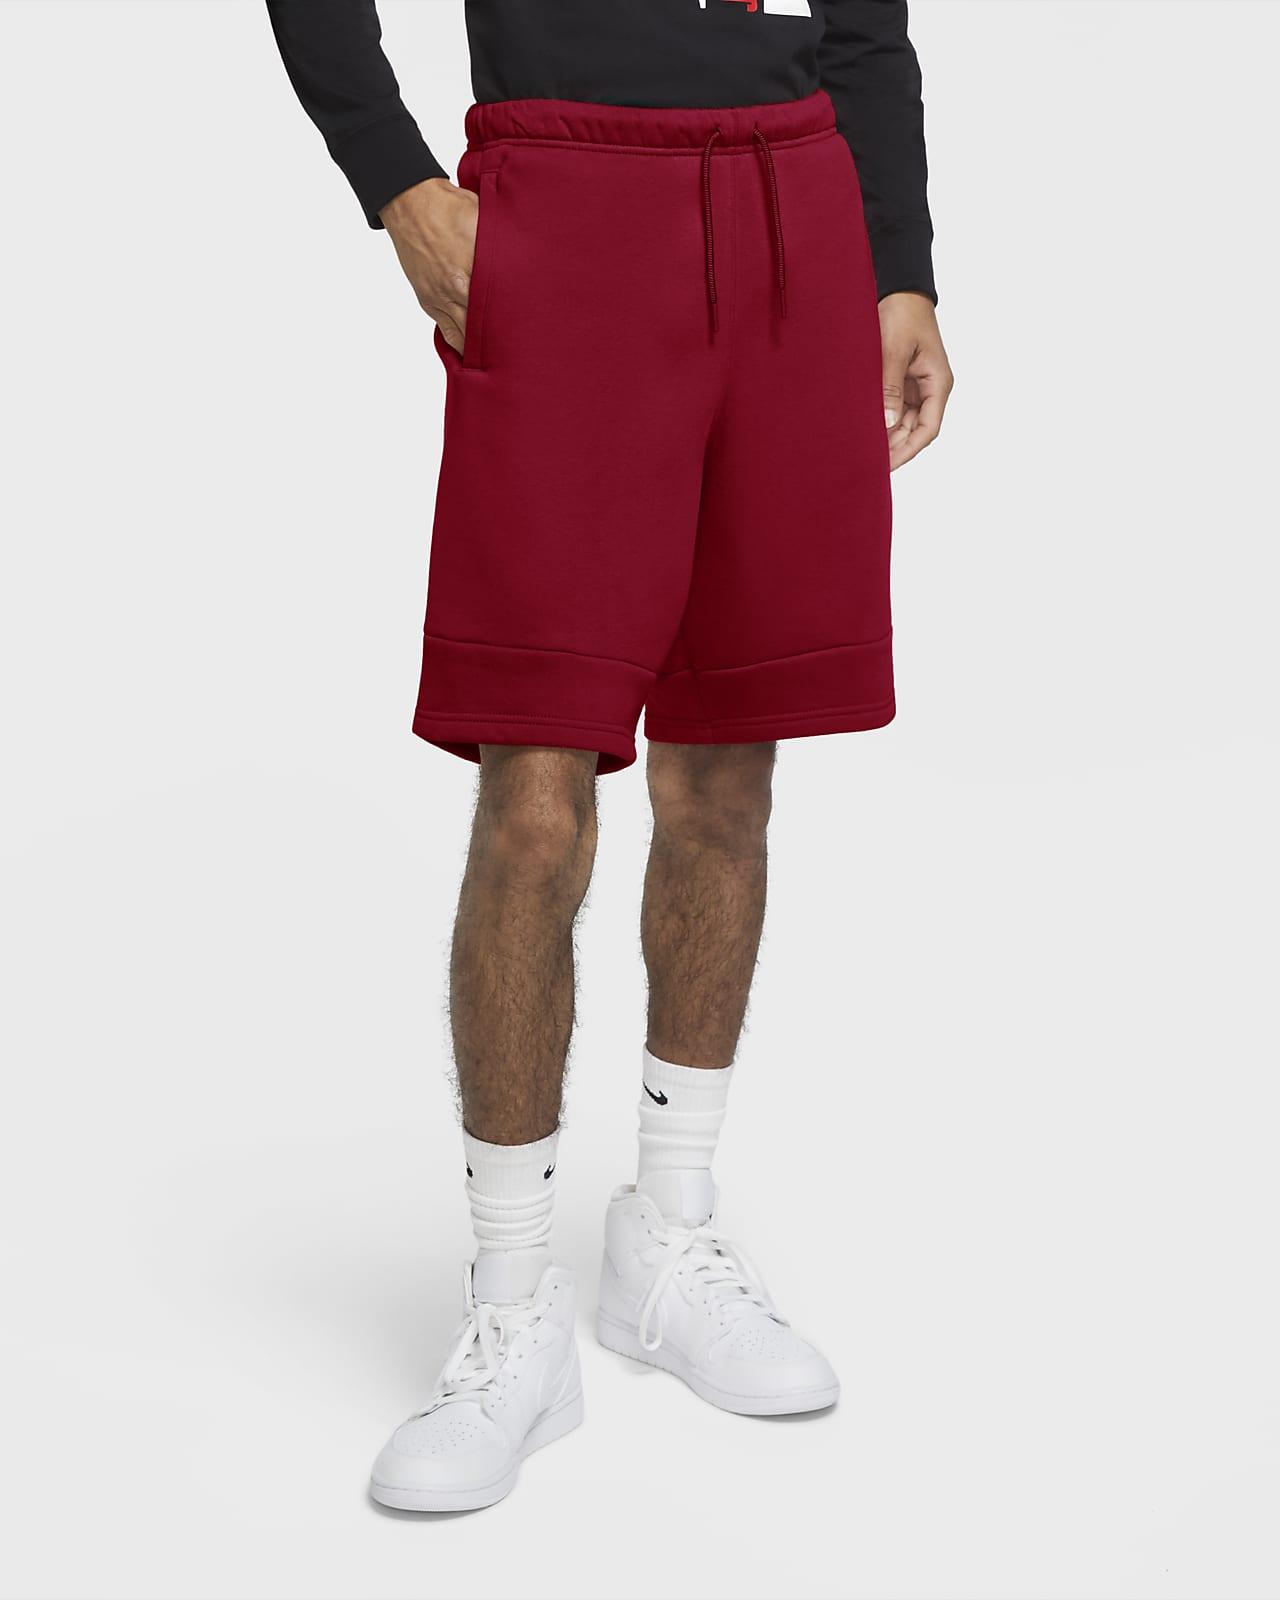 Eliminar Jabón exageración  Jordan Jumpman Air Pantalón corto de tejido Fleece - Hombre. Nike ES